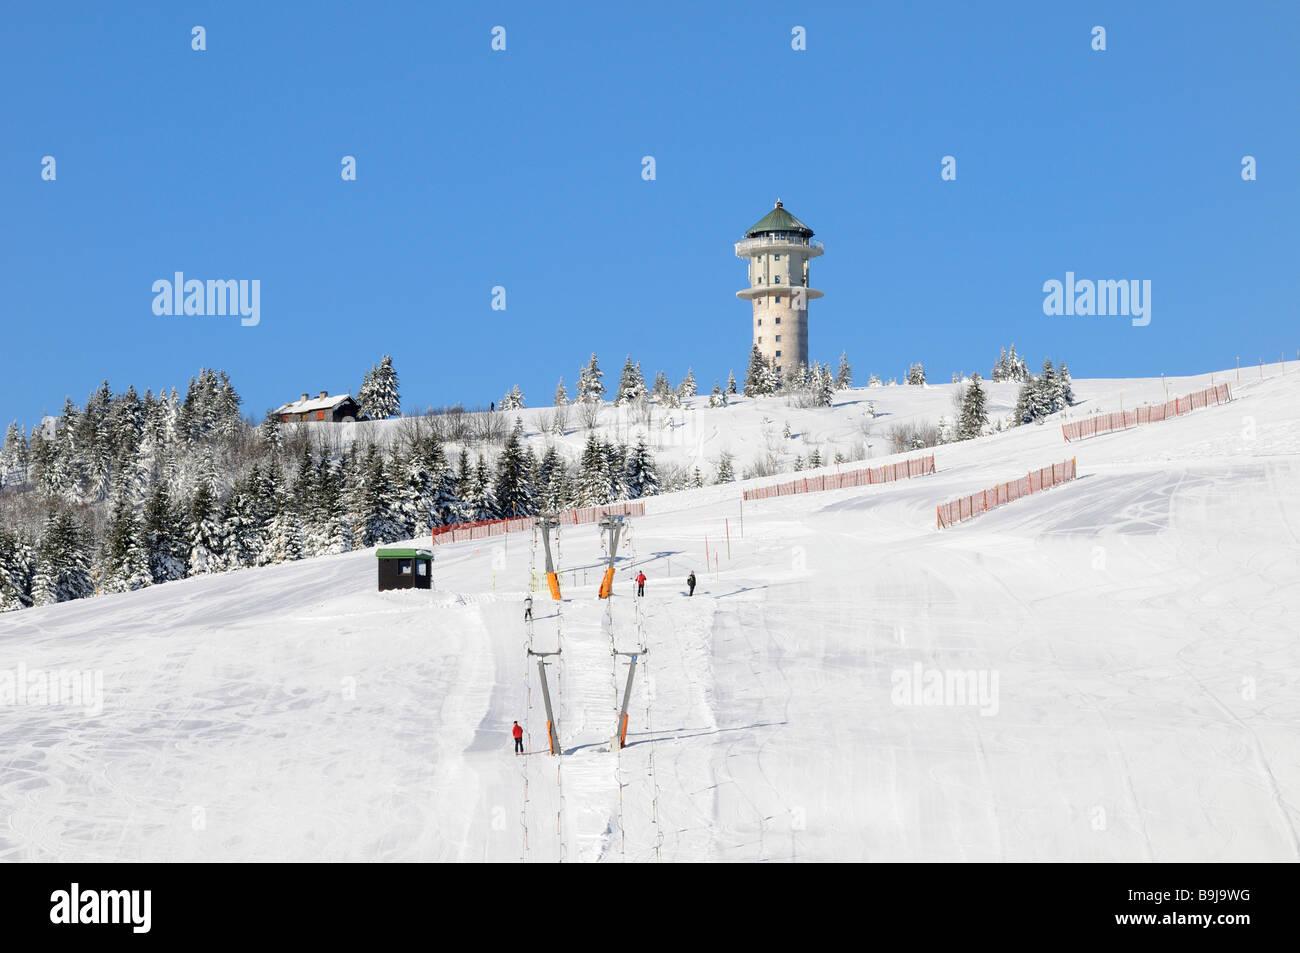 Ski lift and ski slope on Feldberg in the Black Forest, Baden-Wuerttemberg, Germany, Europe Stock Photo